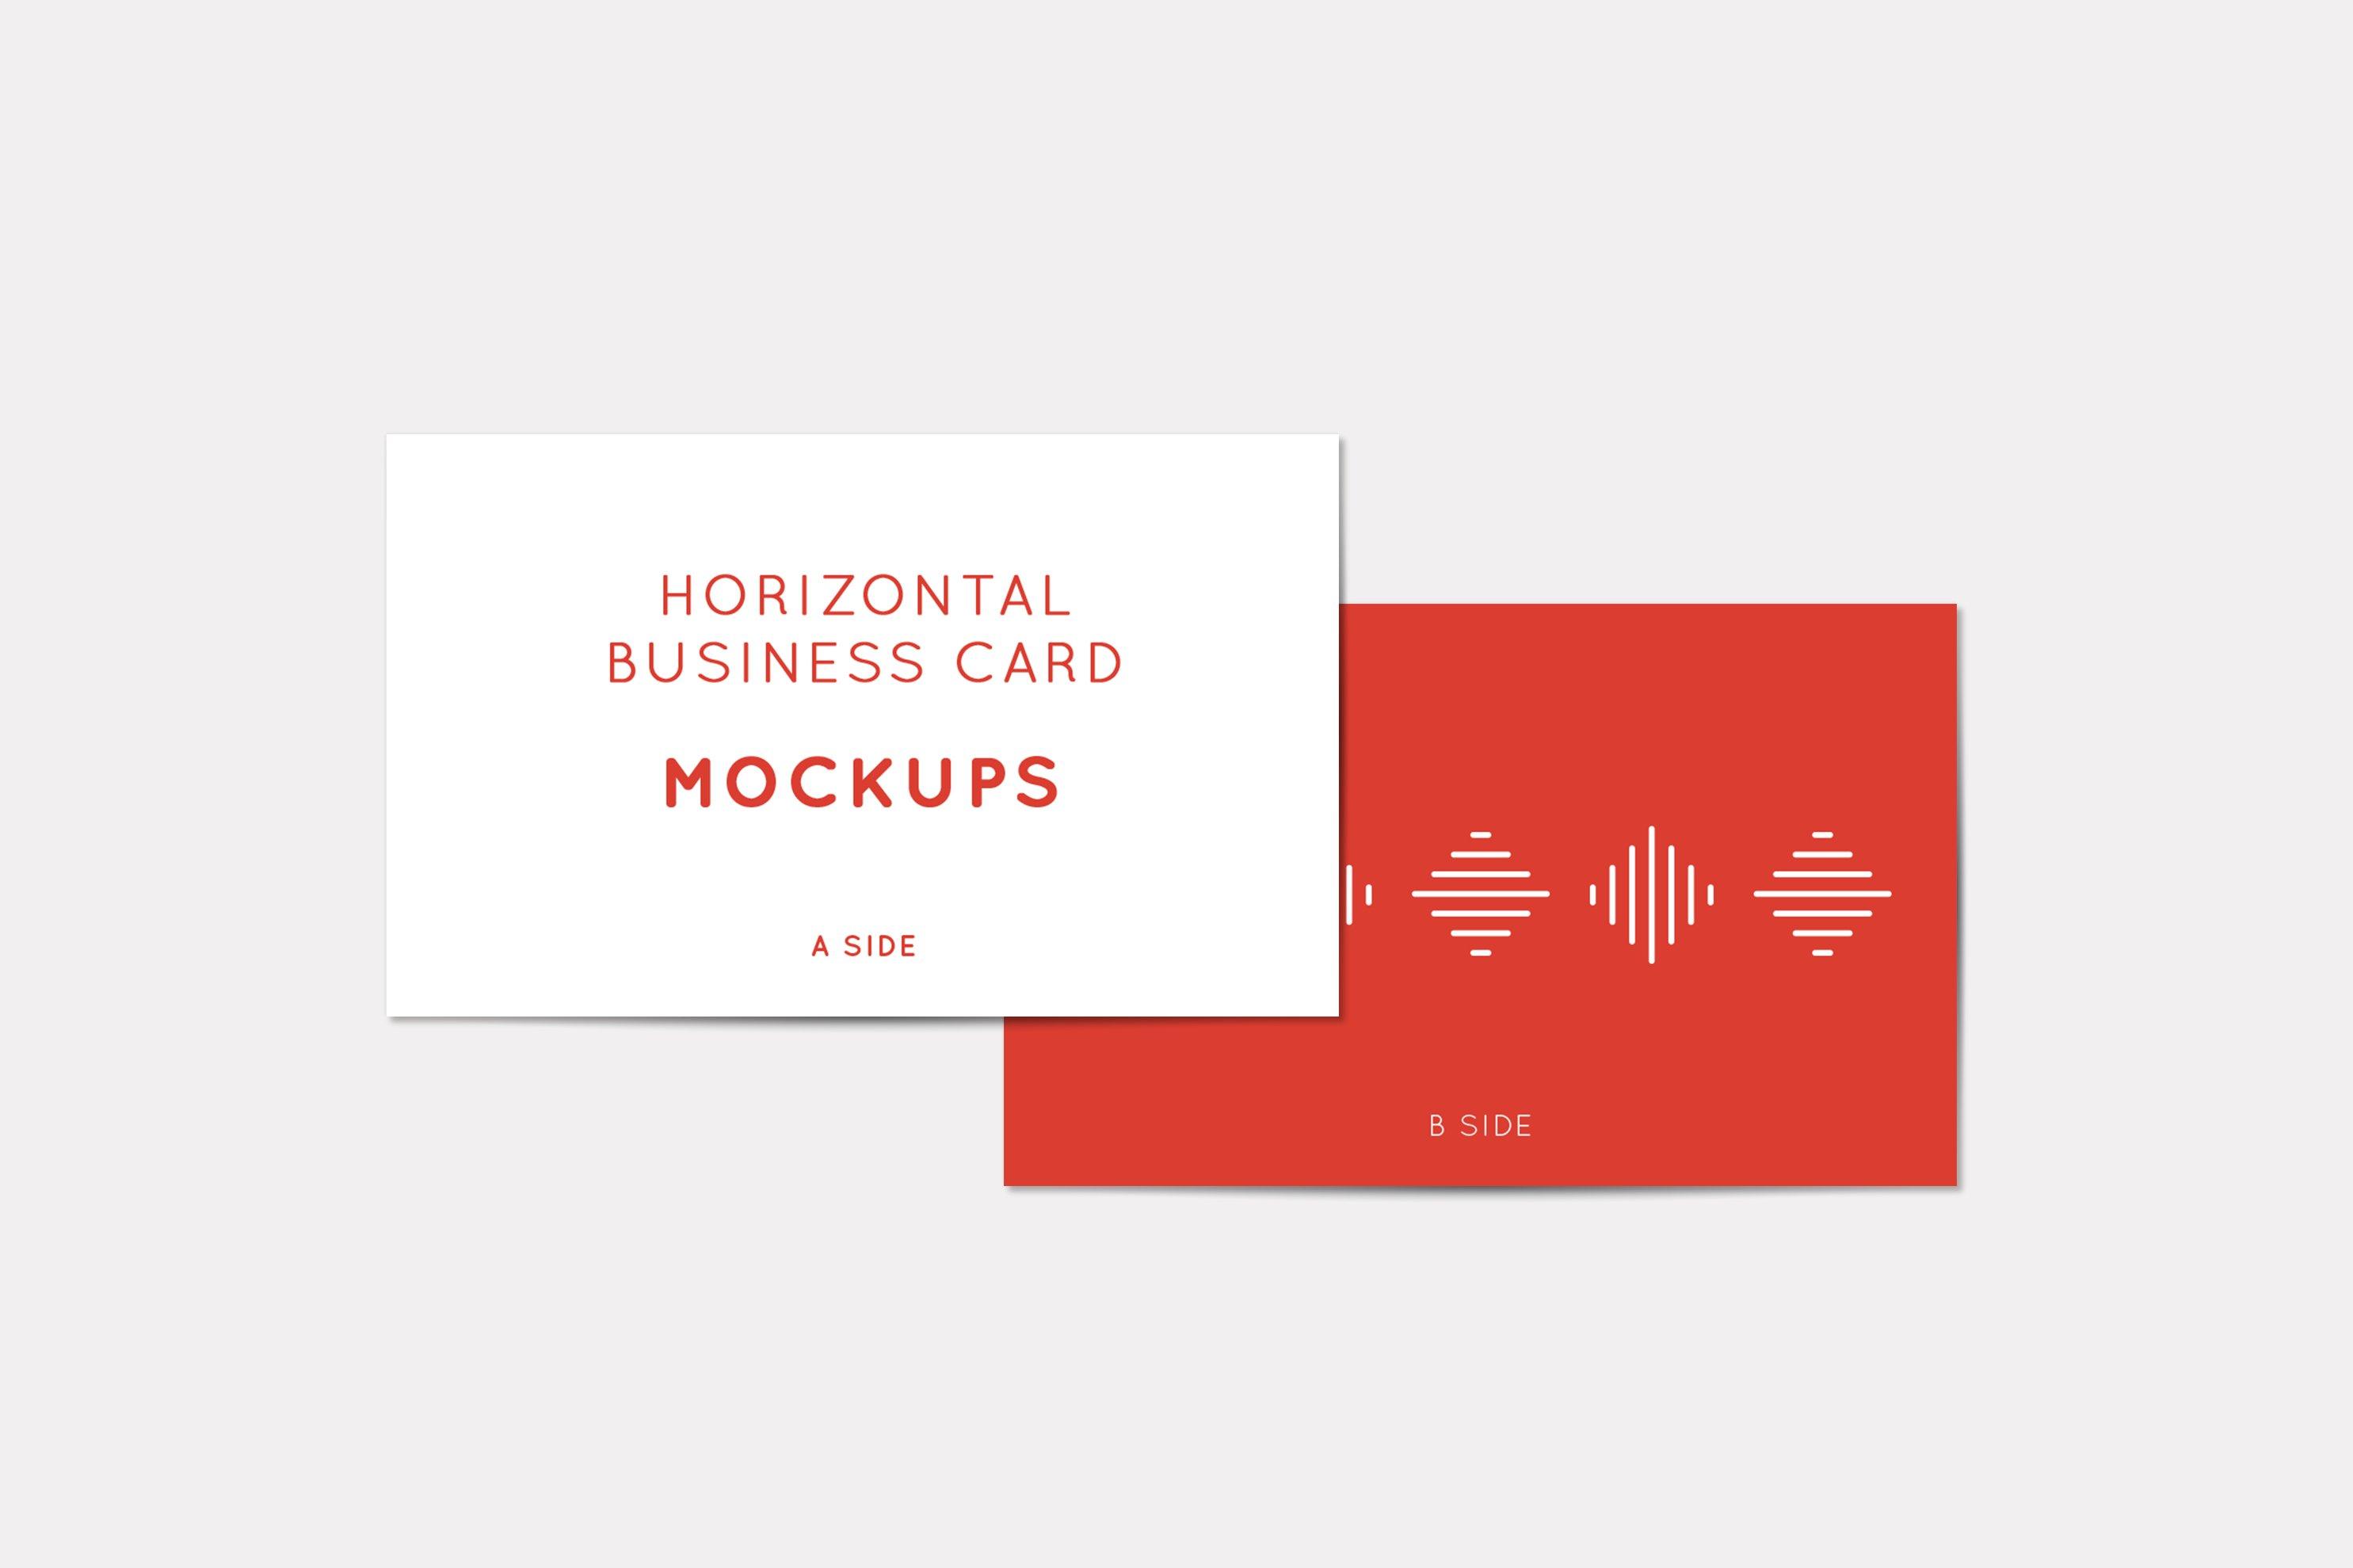 Horizontal Business Card Mockups ~ Product Mockups ~ Creative Market